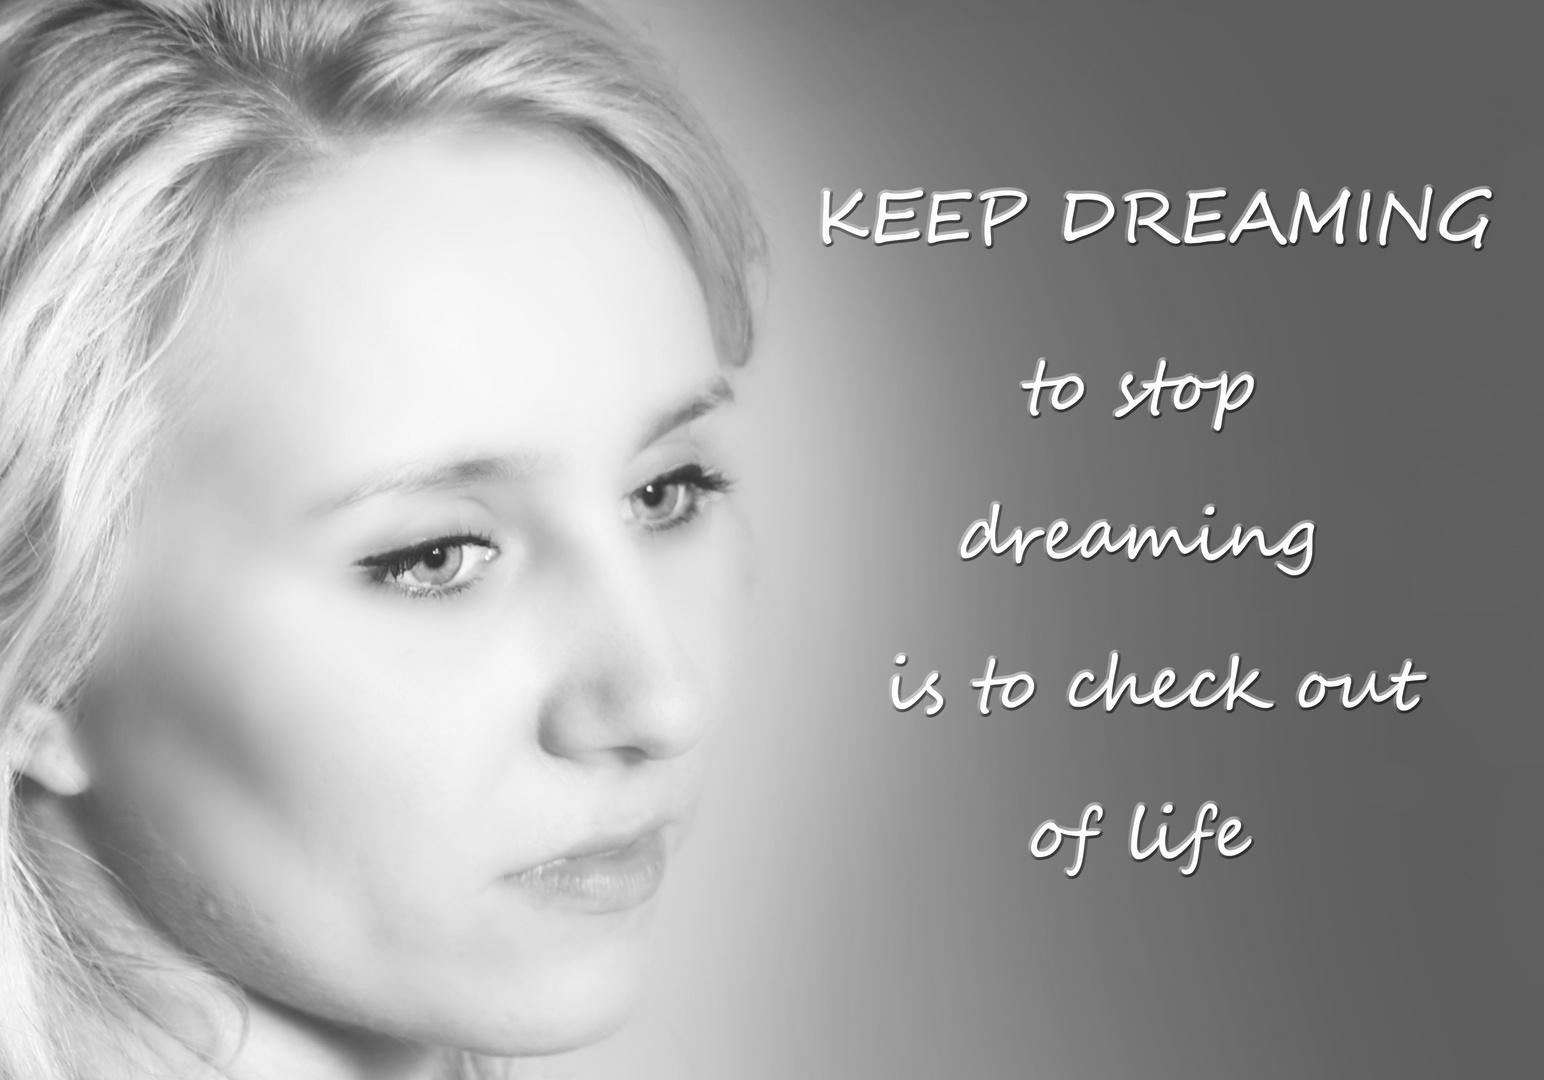 *** KEEP DREAMING ***